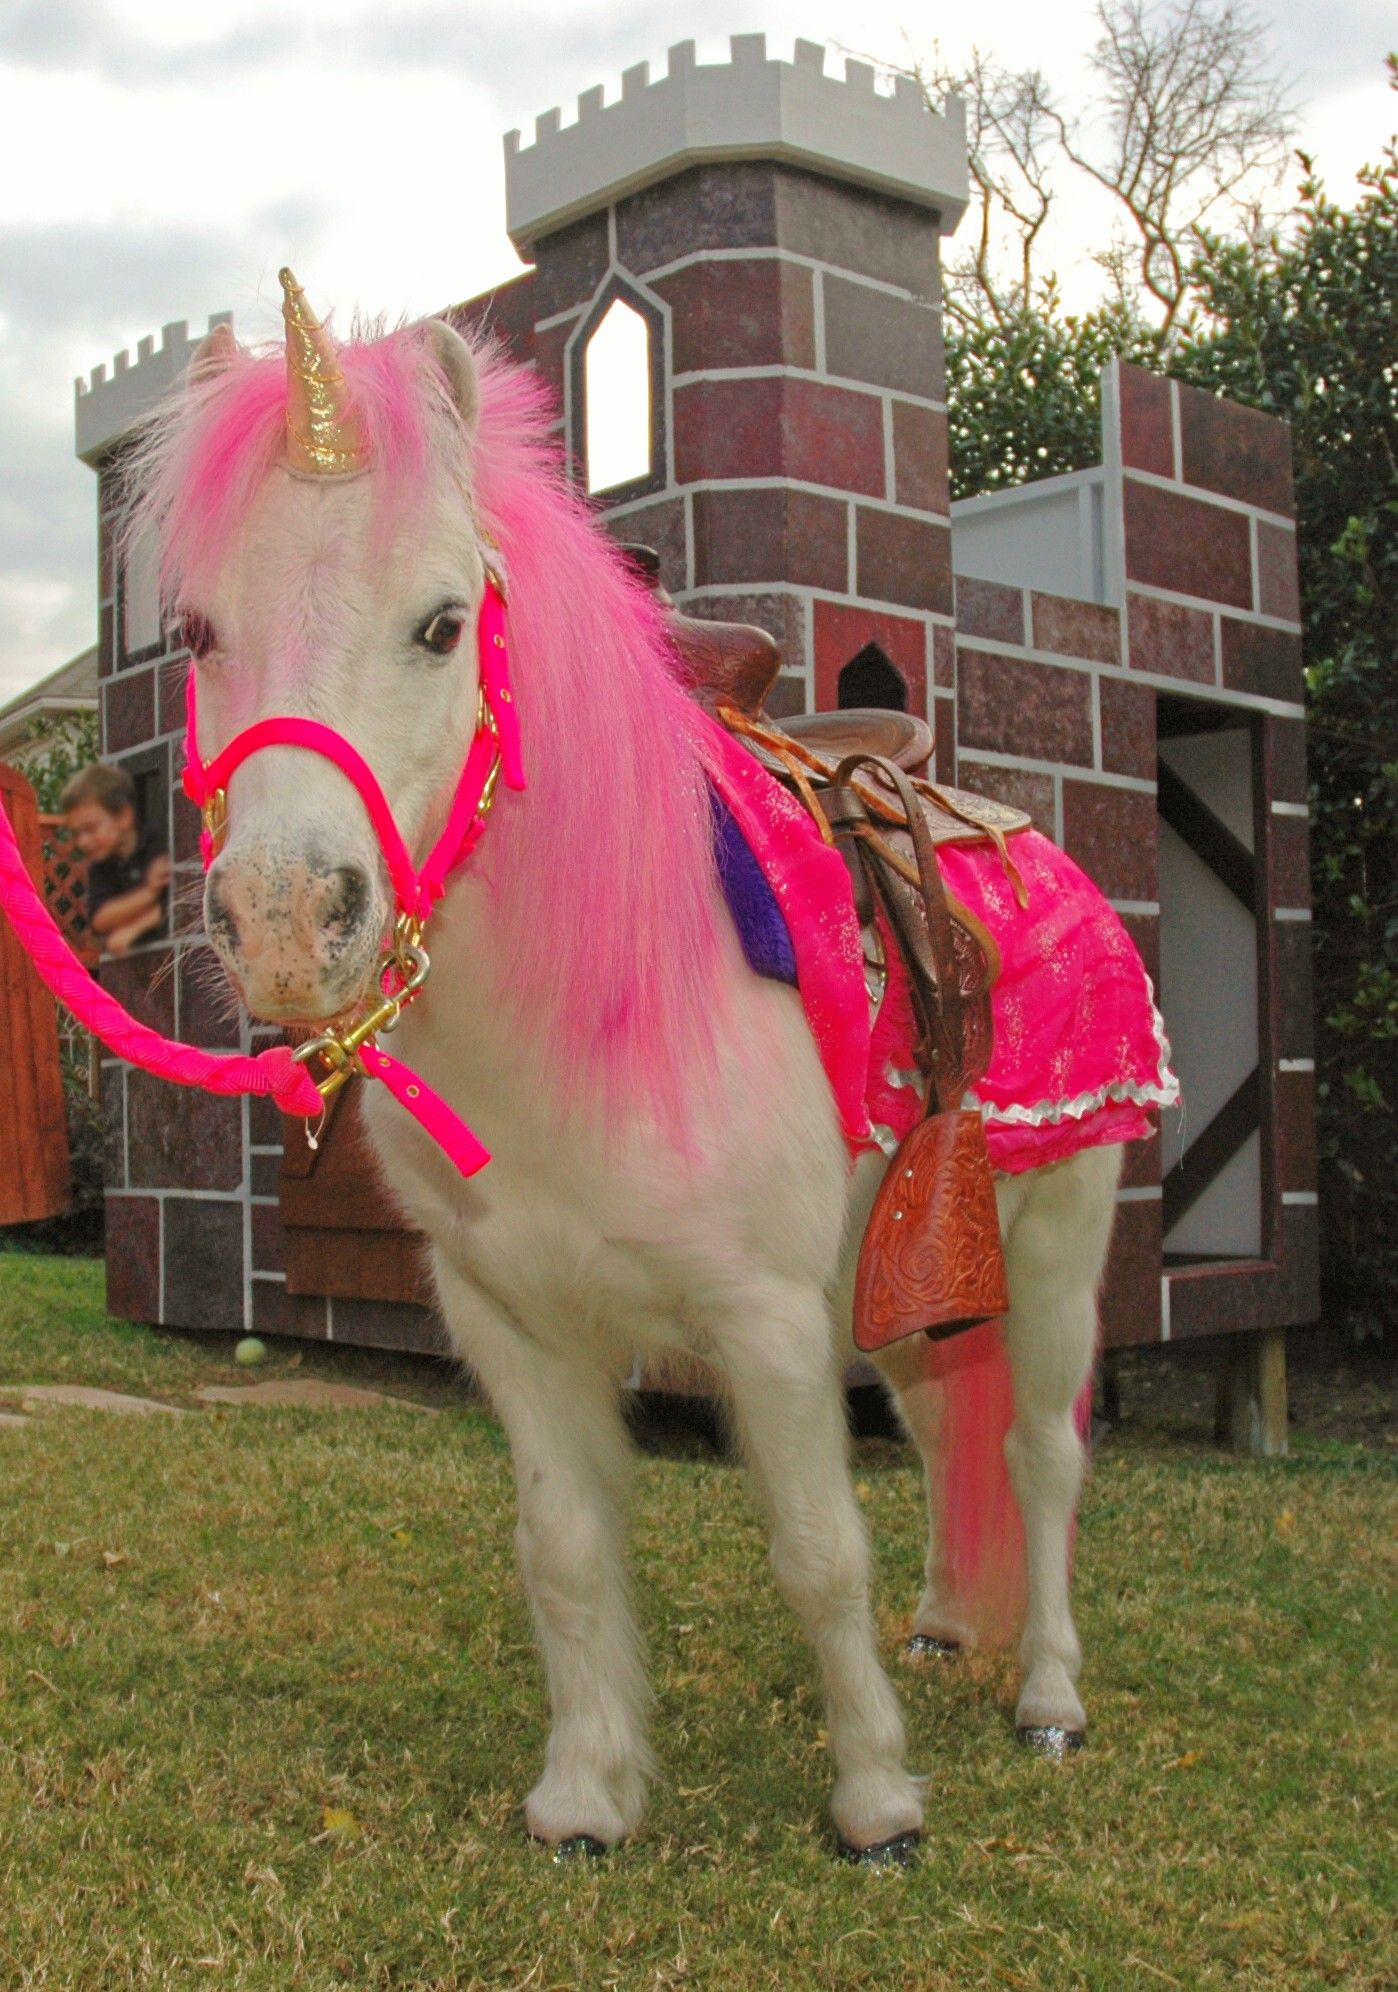 Www Dallaspony Com Pferde Party Pony Party Susse Pferde